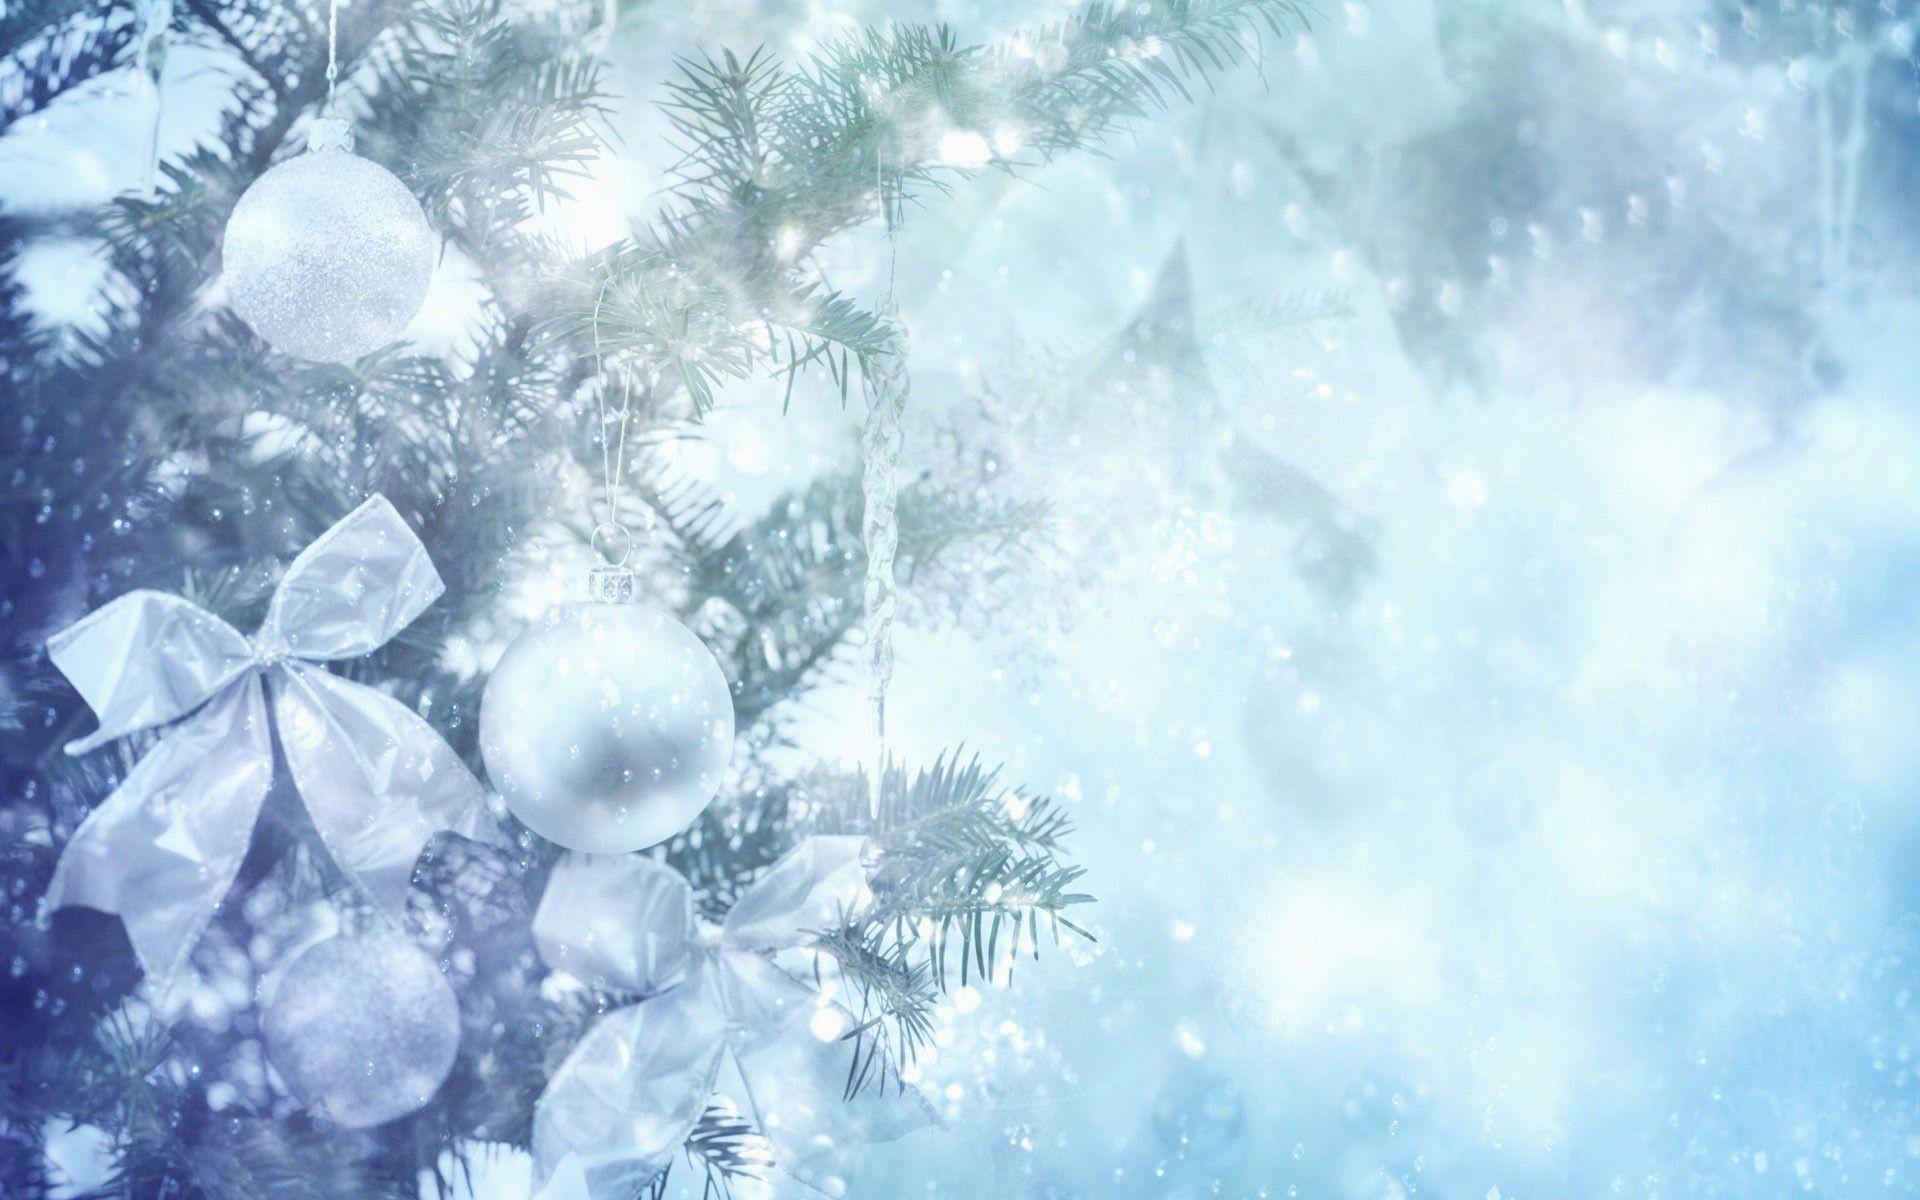 Winter christmas wallpaper - SF Wallpaper